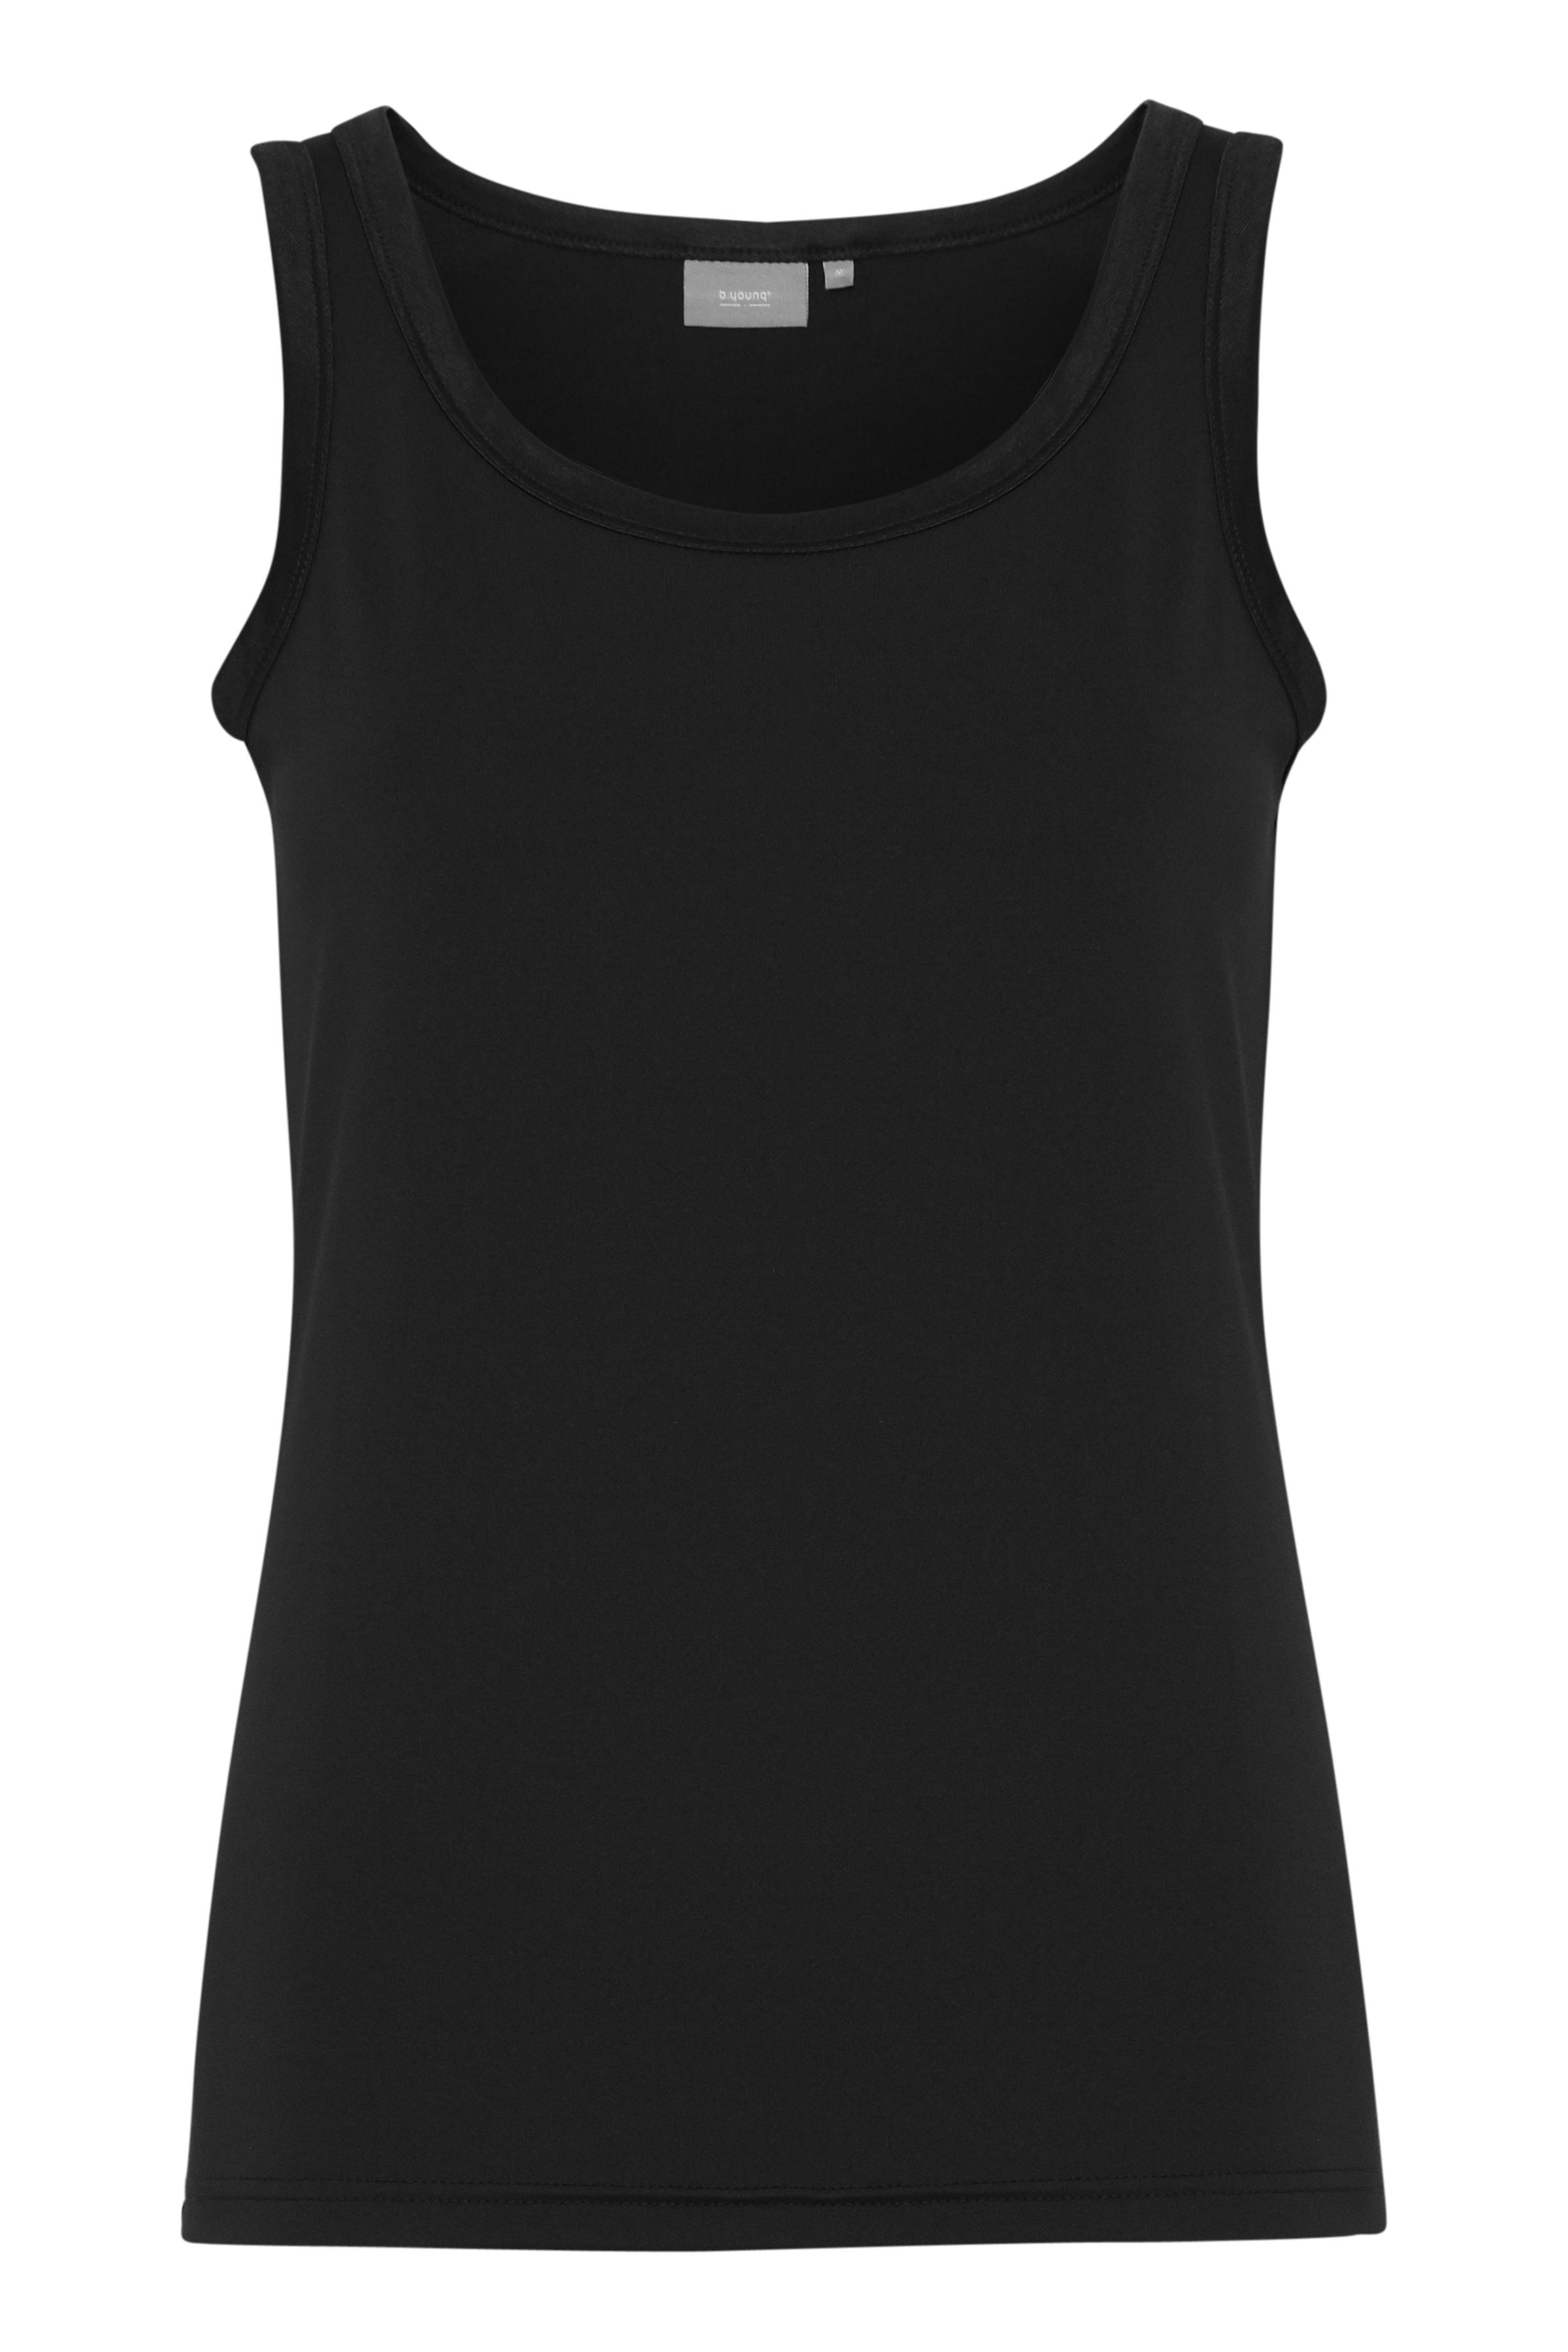 Black Jerseytop fra b.young – Køb Black Jerseytop fra str. XS-XXL her